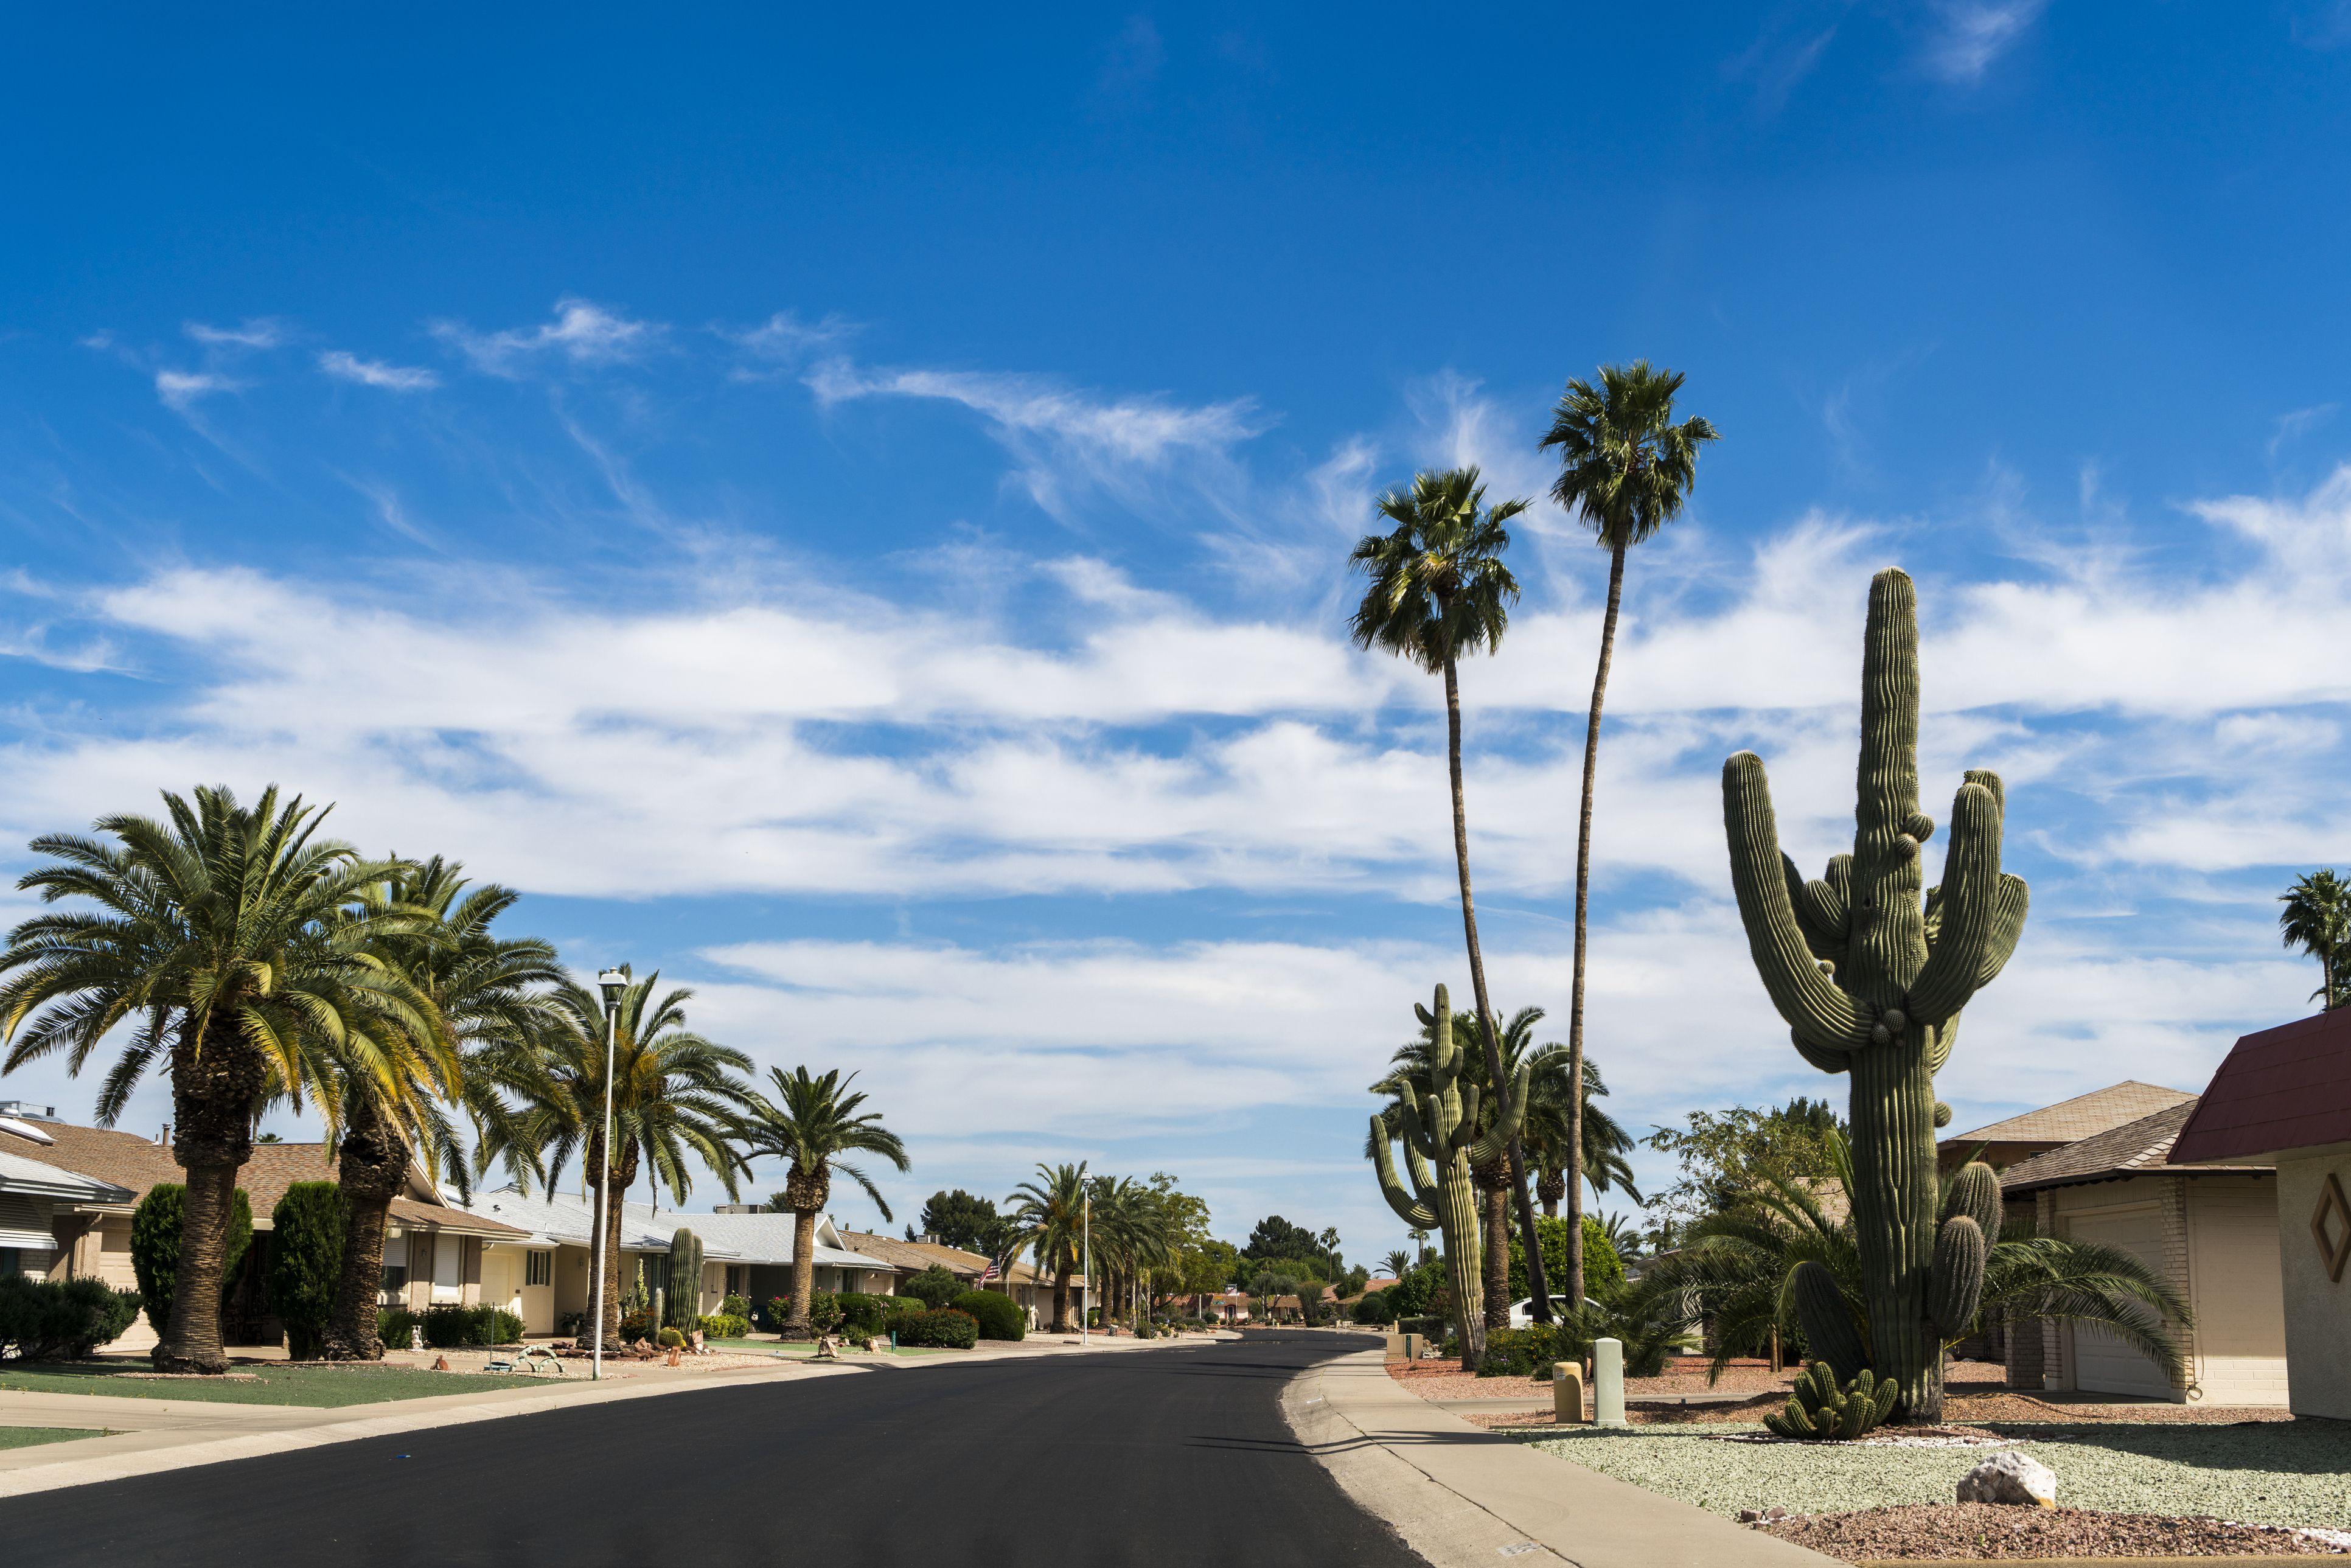 Arizona State Travel Guide